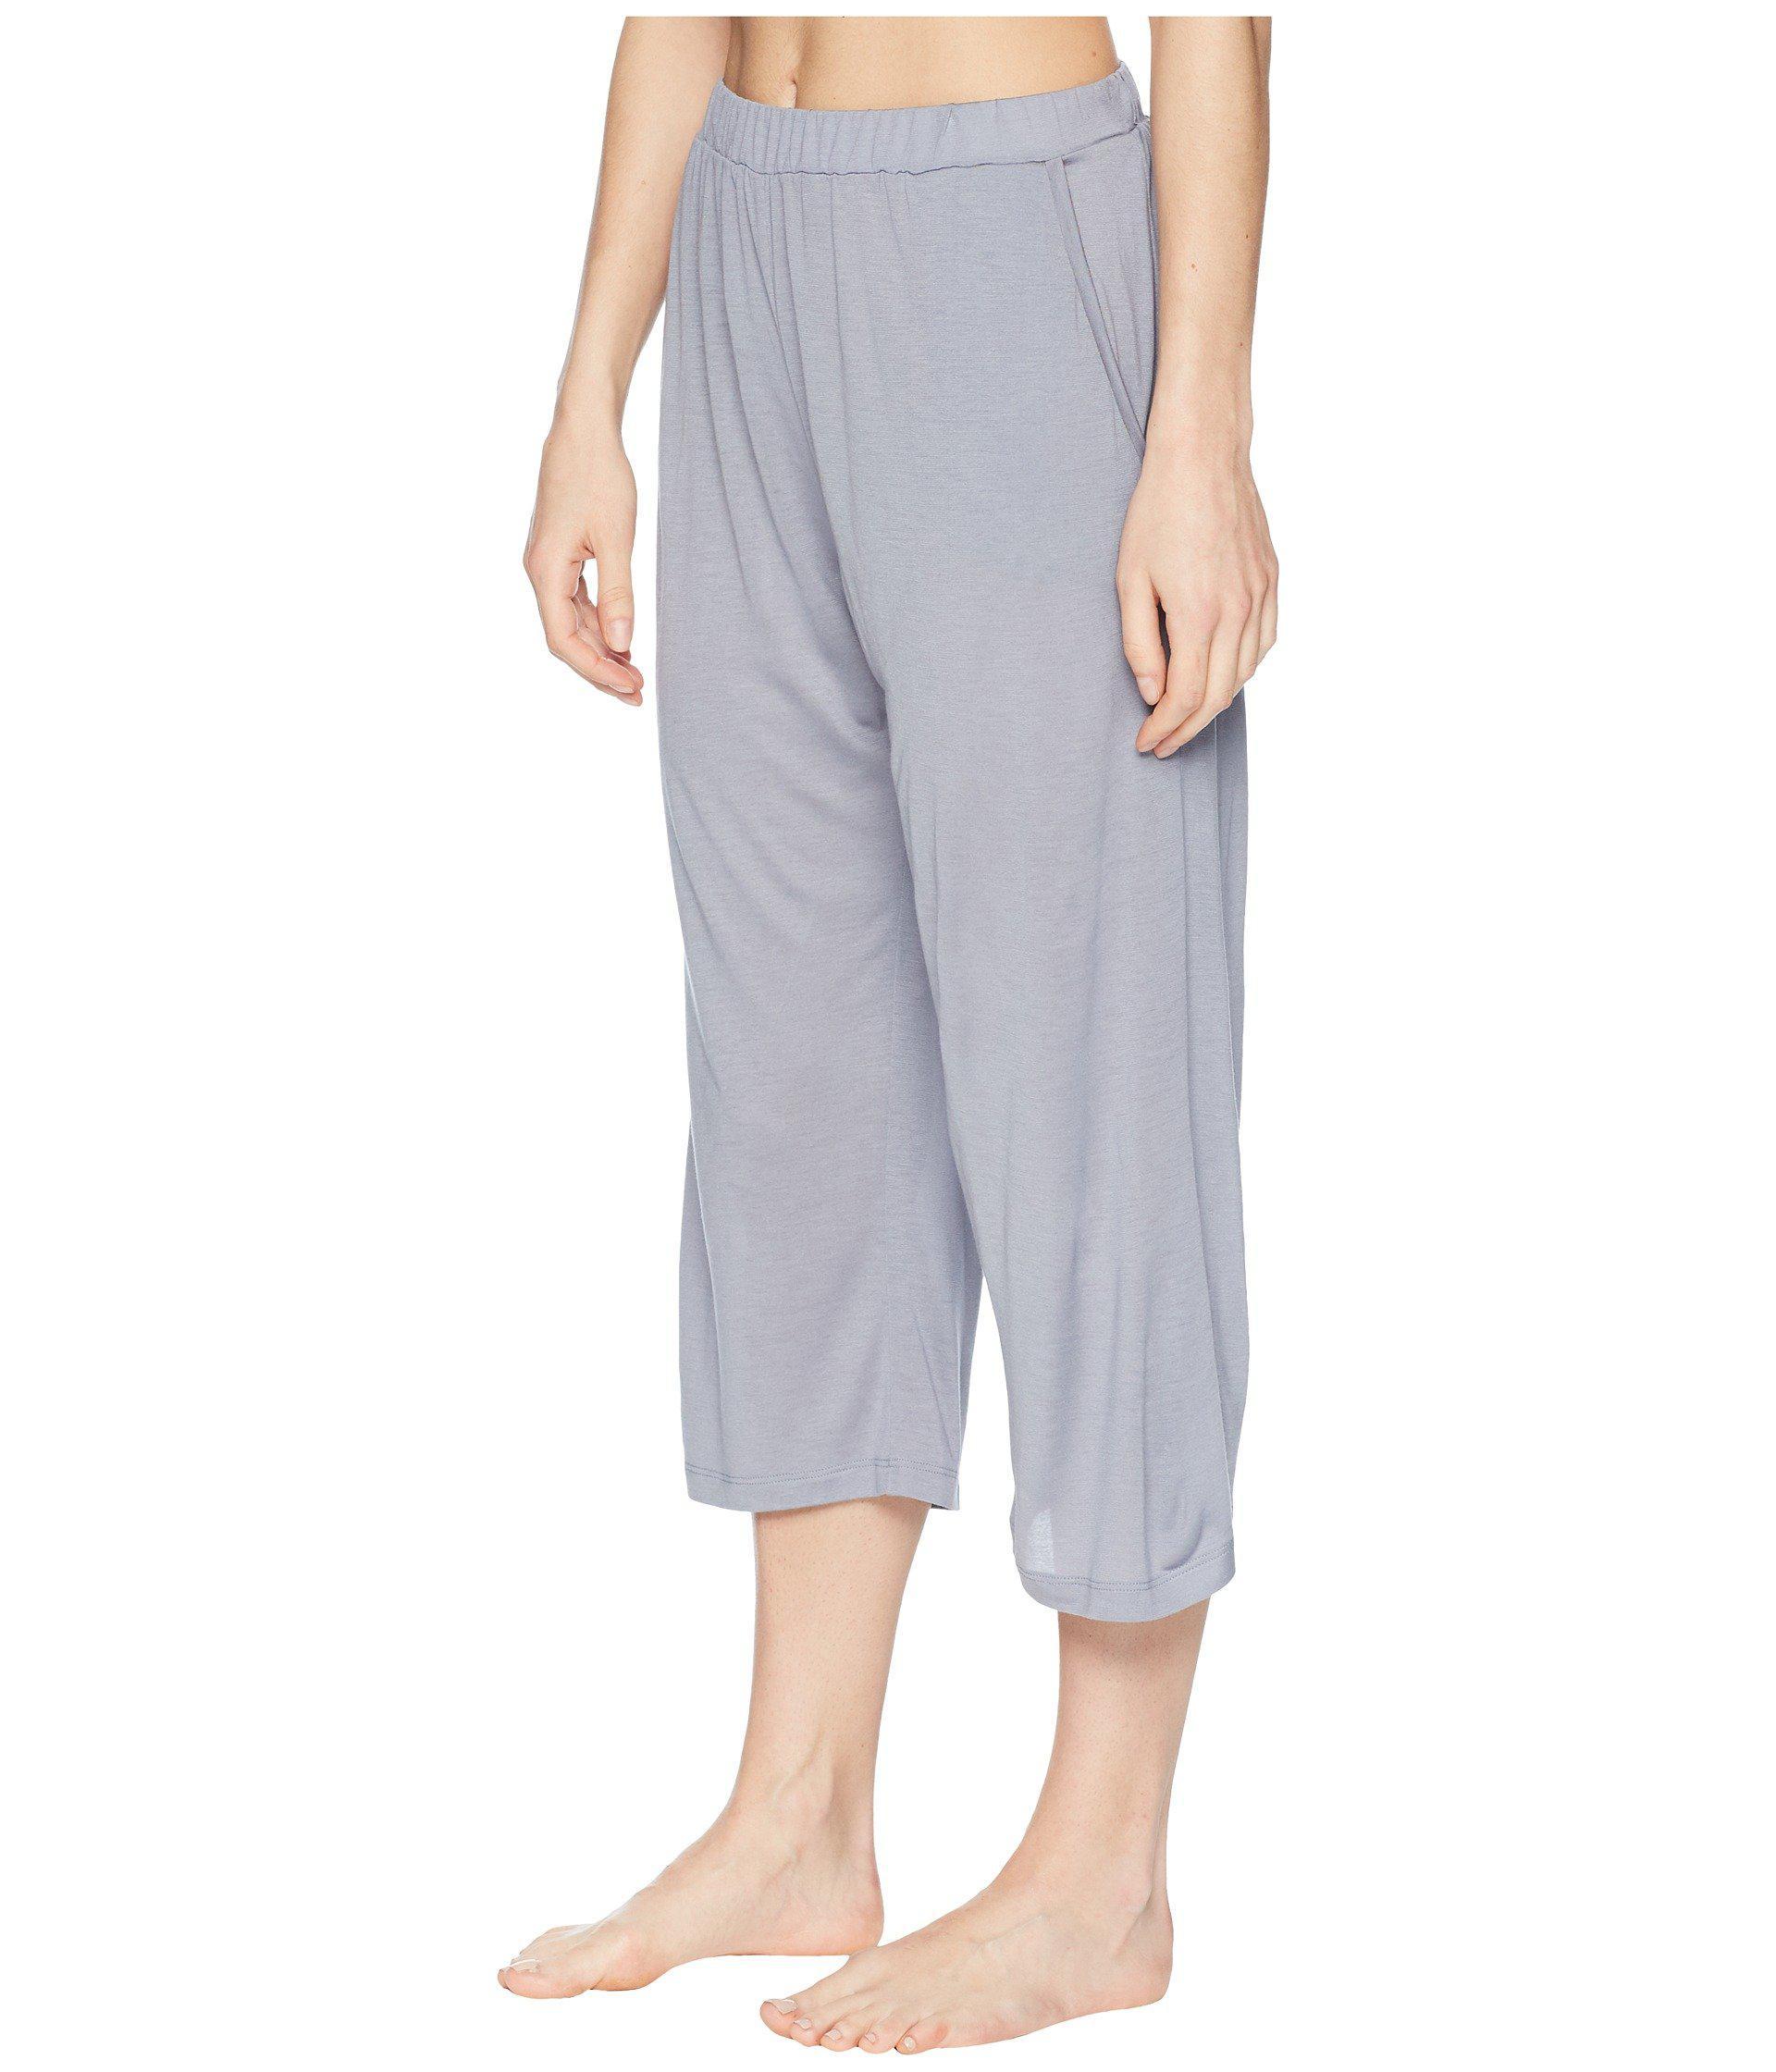 96ce74244d Lyst - Hanro Malva Crop Pants in Gray - Save 36%